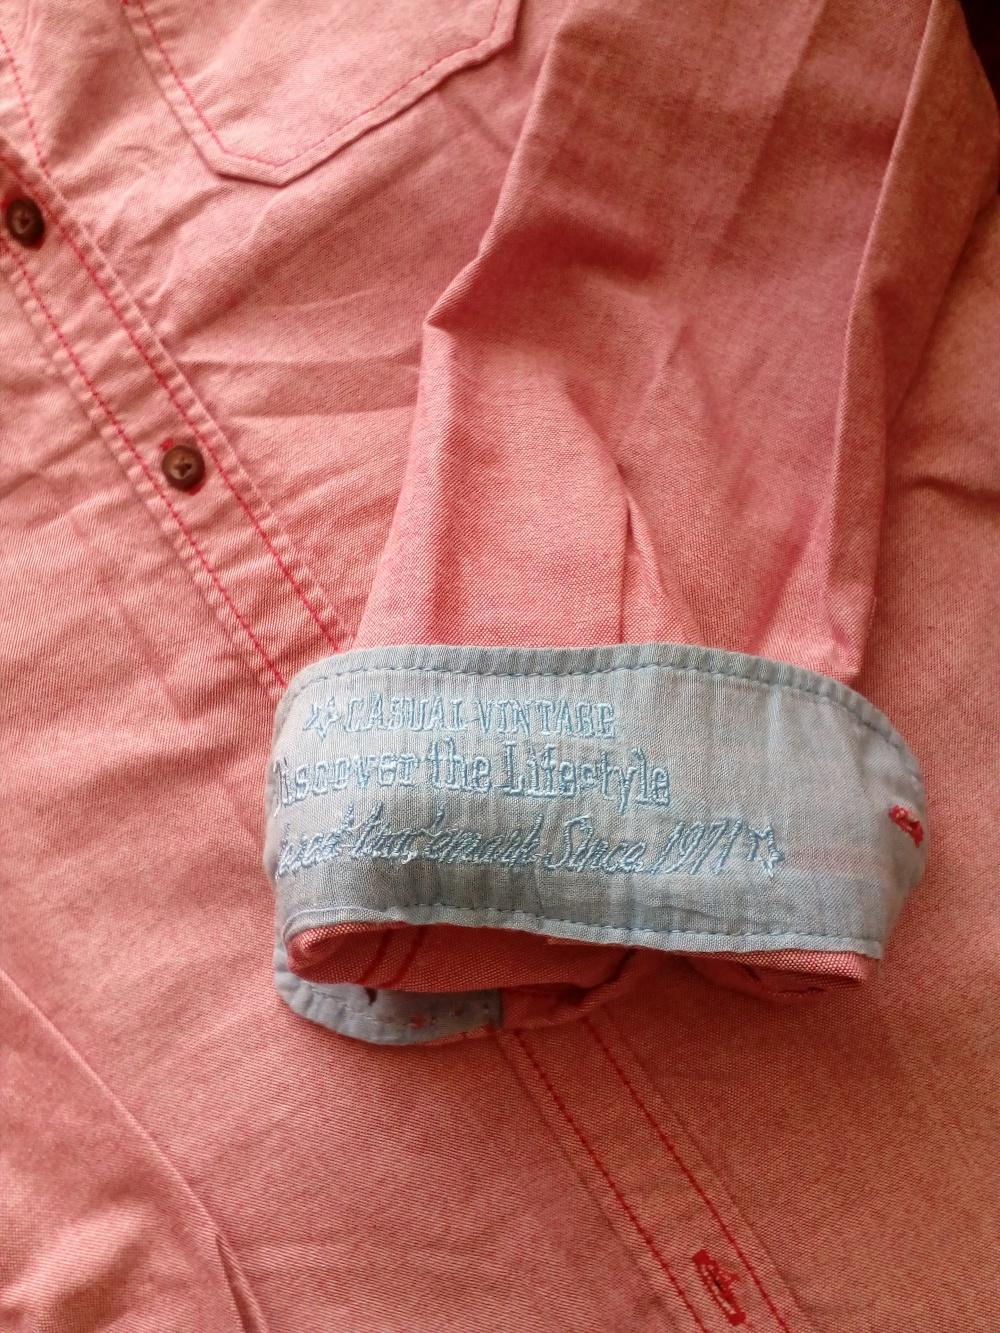 Рубашка. Multiblu. 40